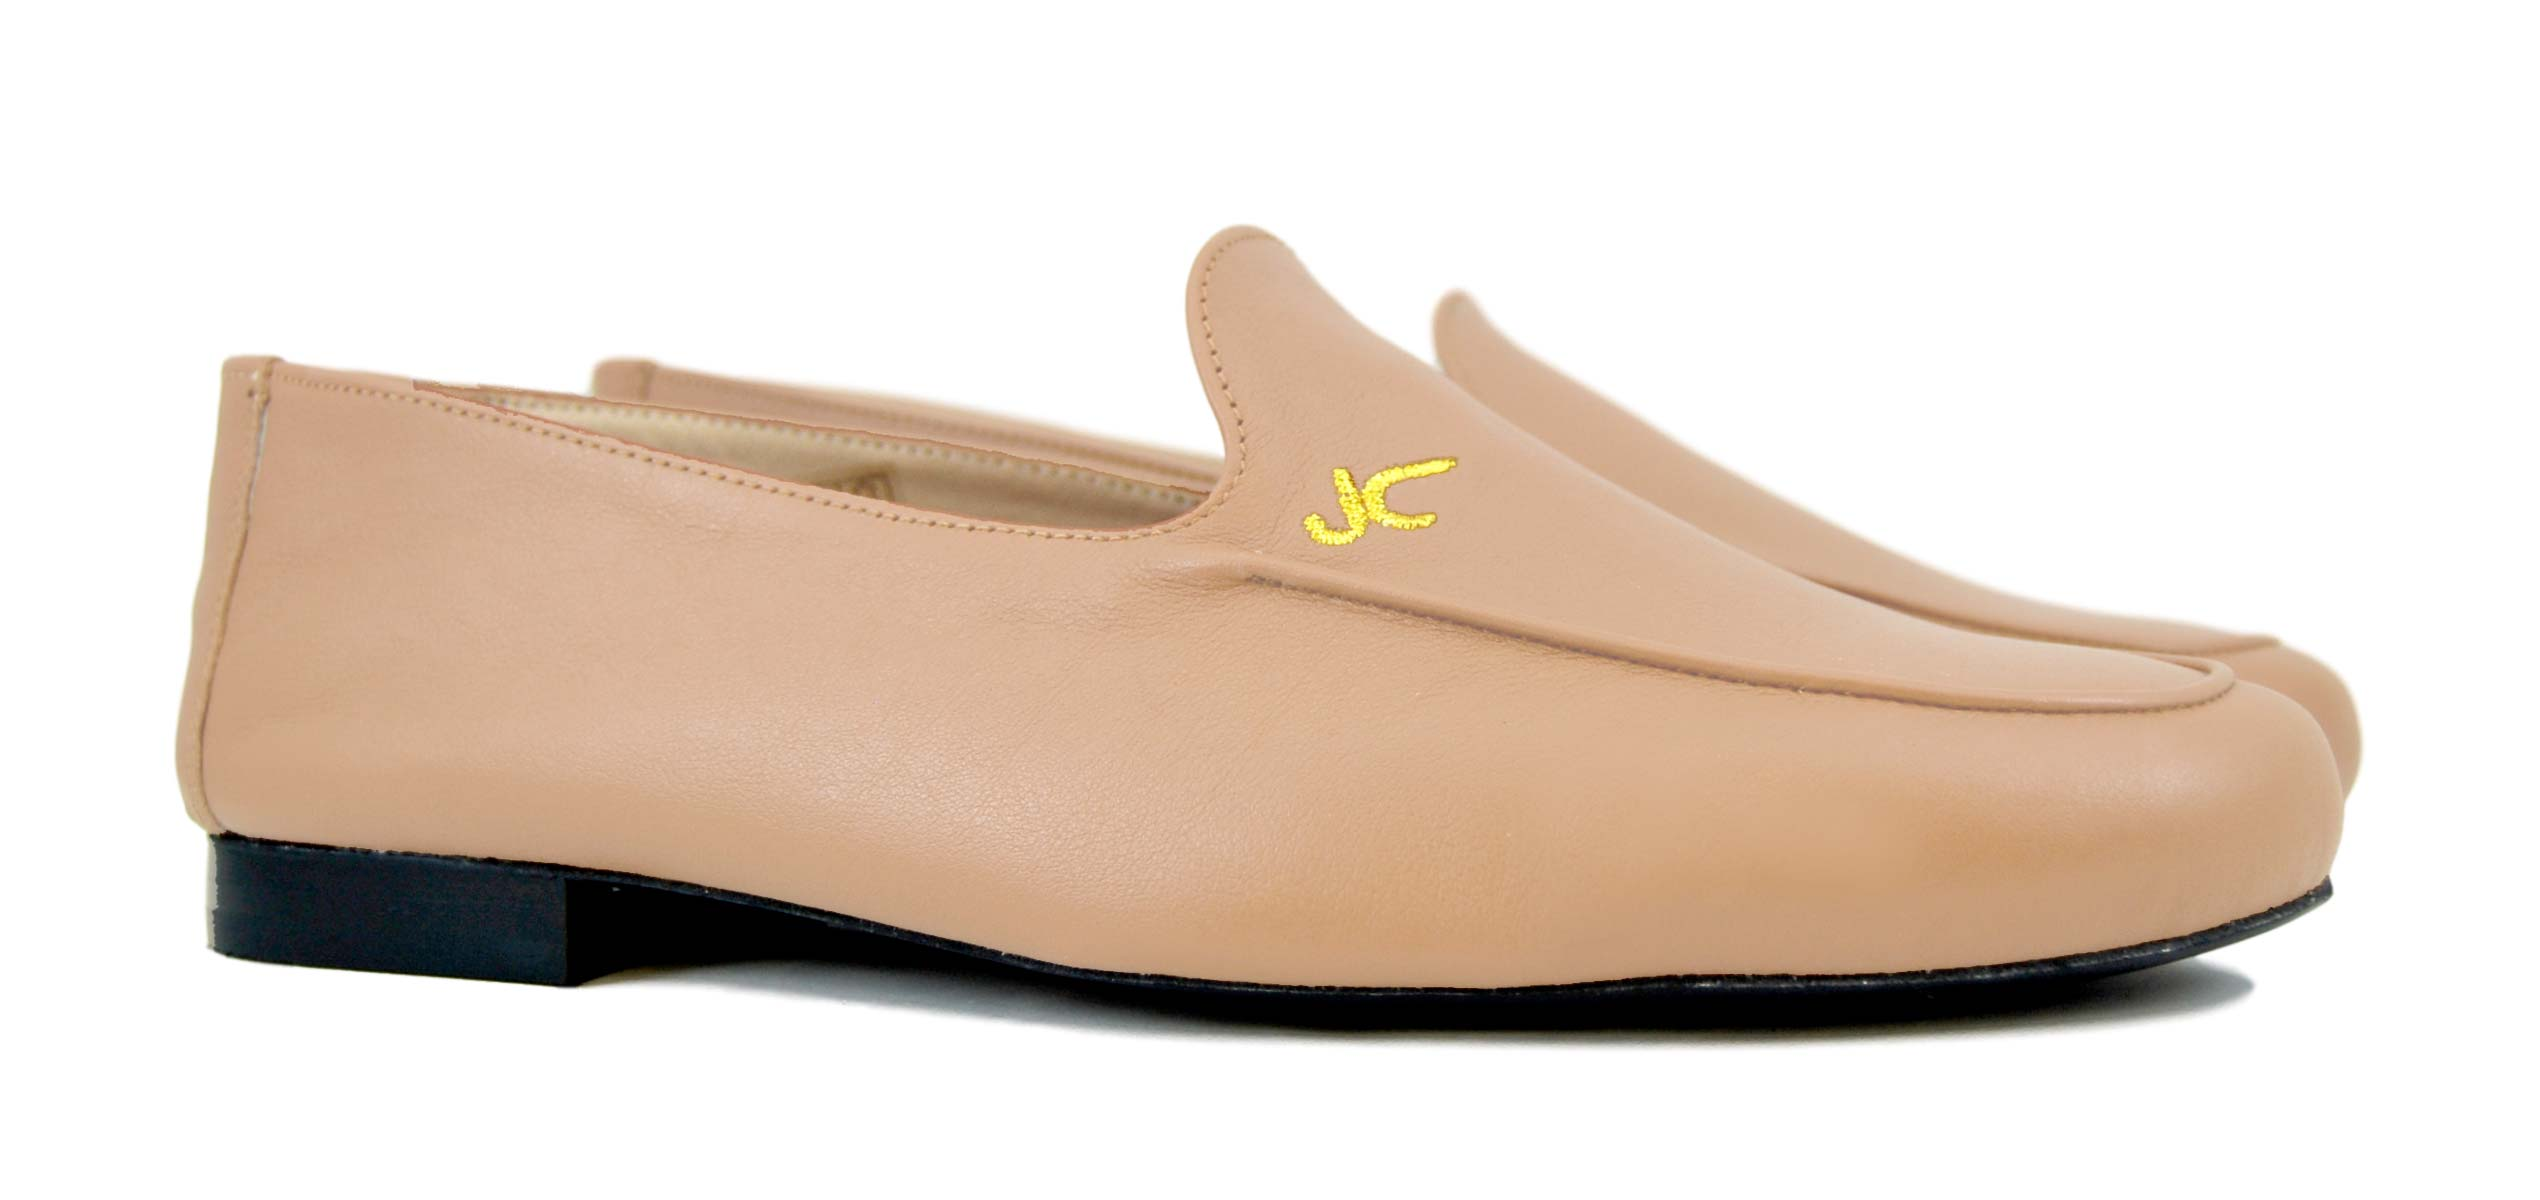 Foto 5 de Zapatos Julio Iglesias 528 JC Pink Napa Piel Original